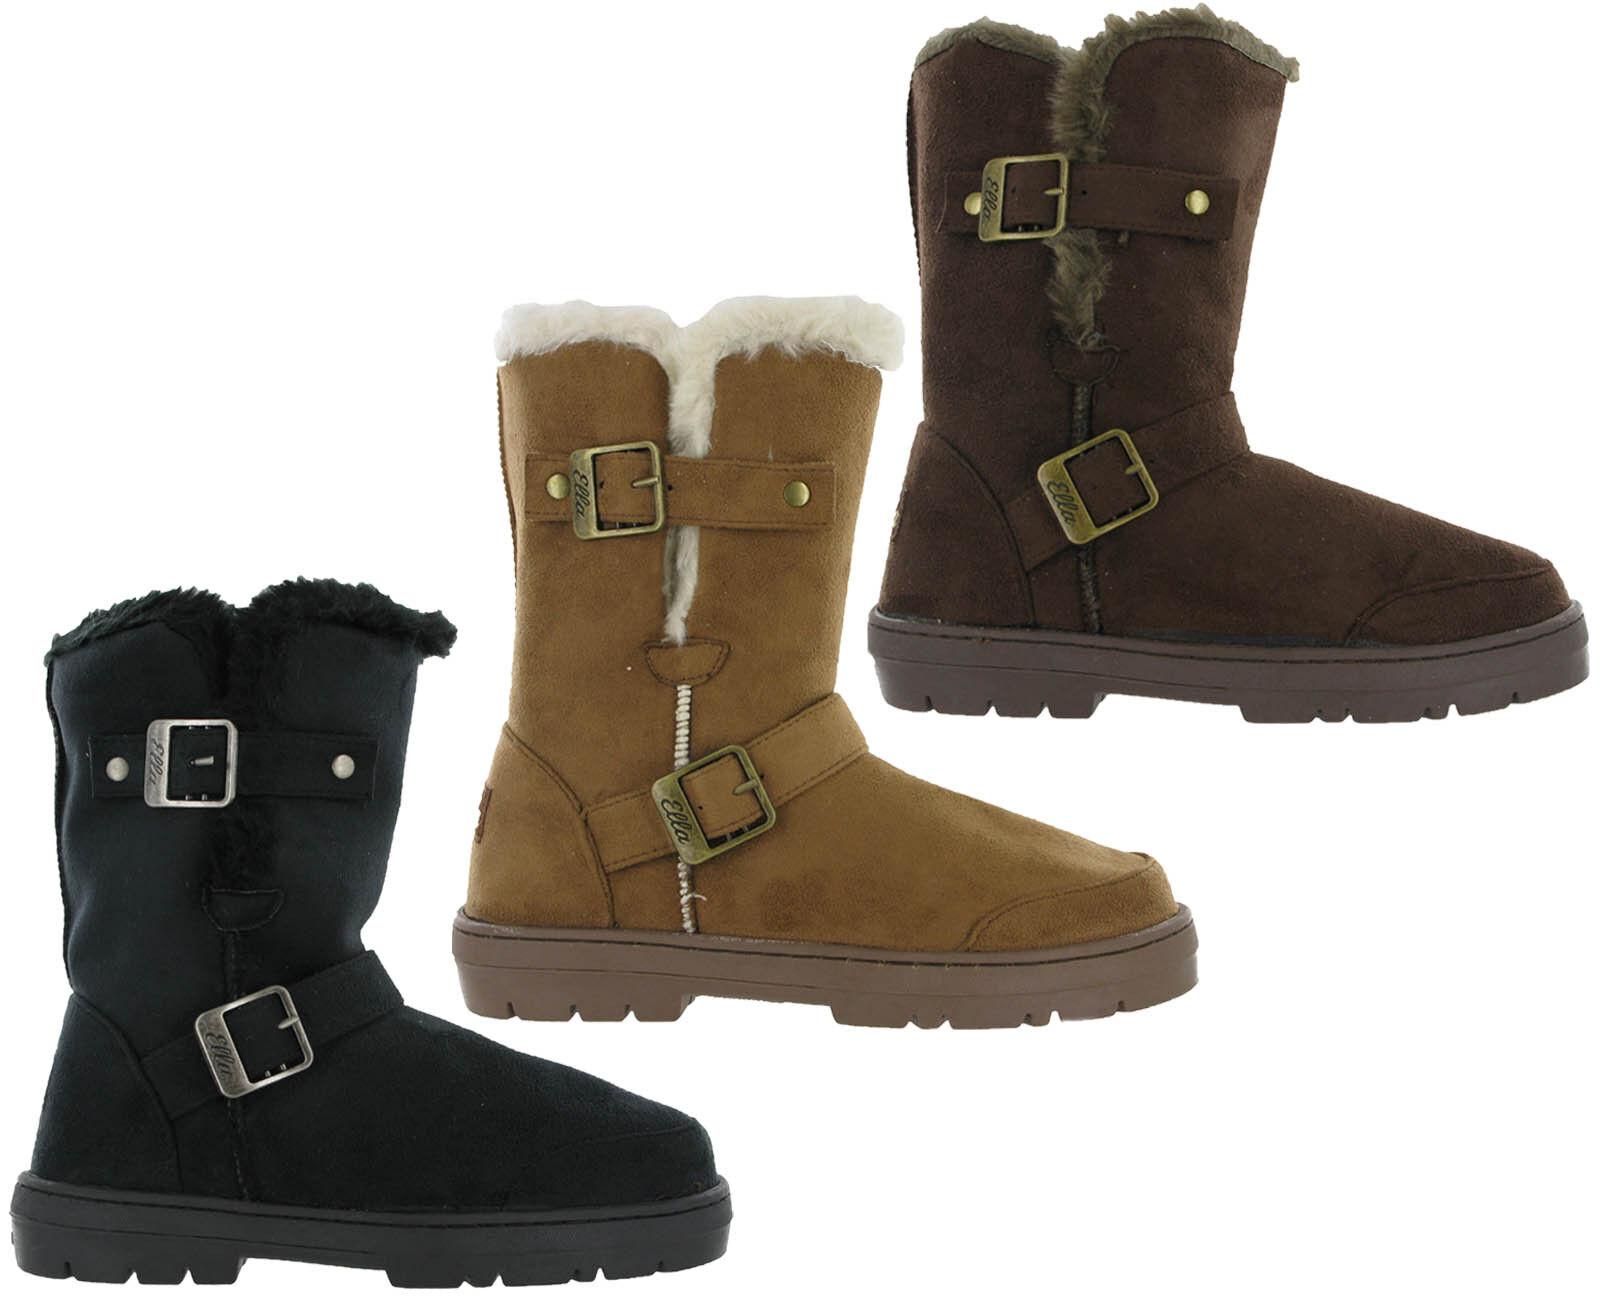 7b5cb8c44a6691 Details about Ella Fur Lined Alex Twin Buckle Snugg Warm Flat Womens Winter  Boots UK 3 - 8